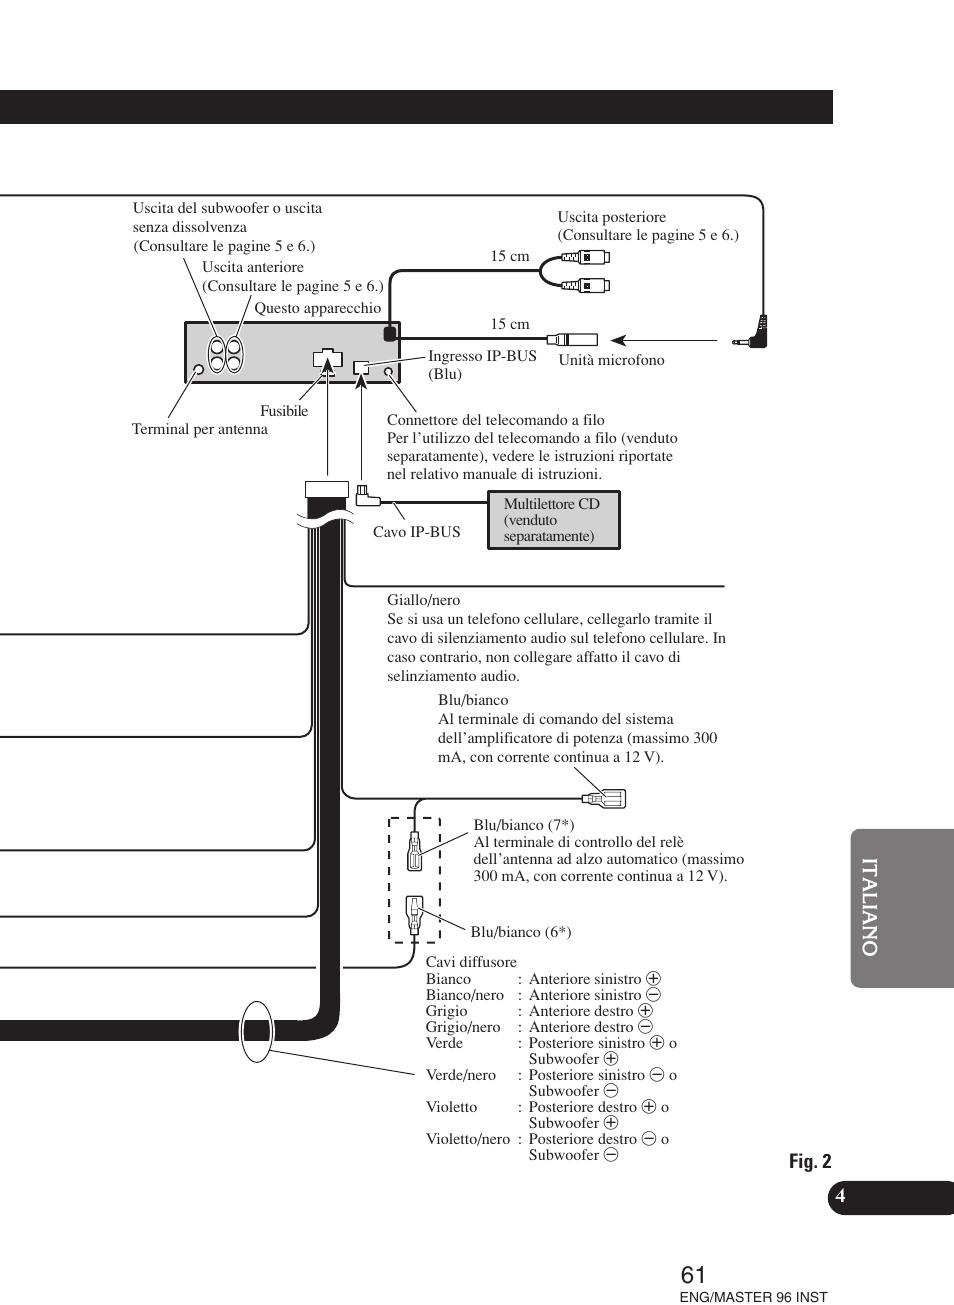 pioneer deh p70bt user manual page 61 86 original mode rh manualsdir com Nero 6 Windows 7 Nero 6 Serial Number